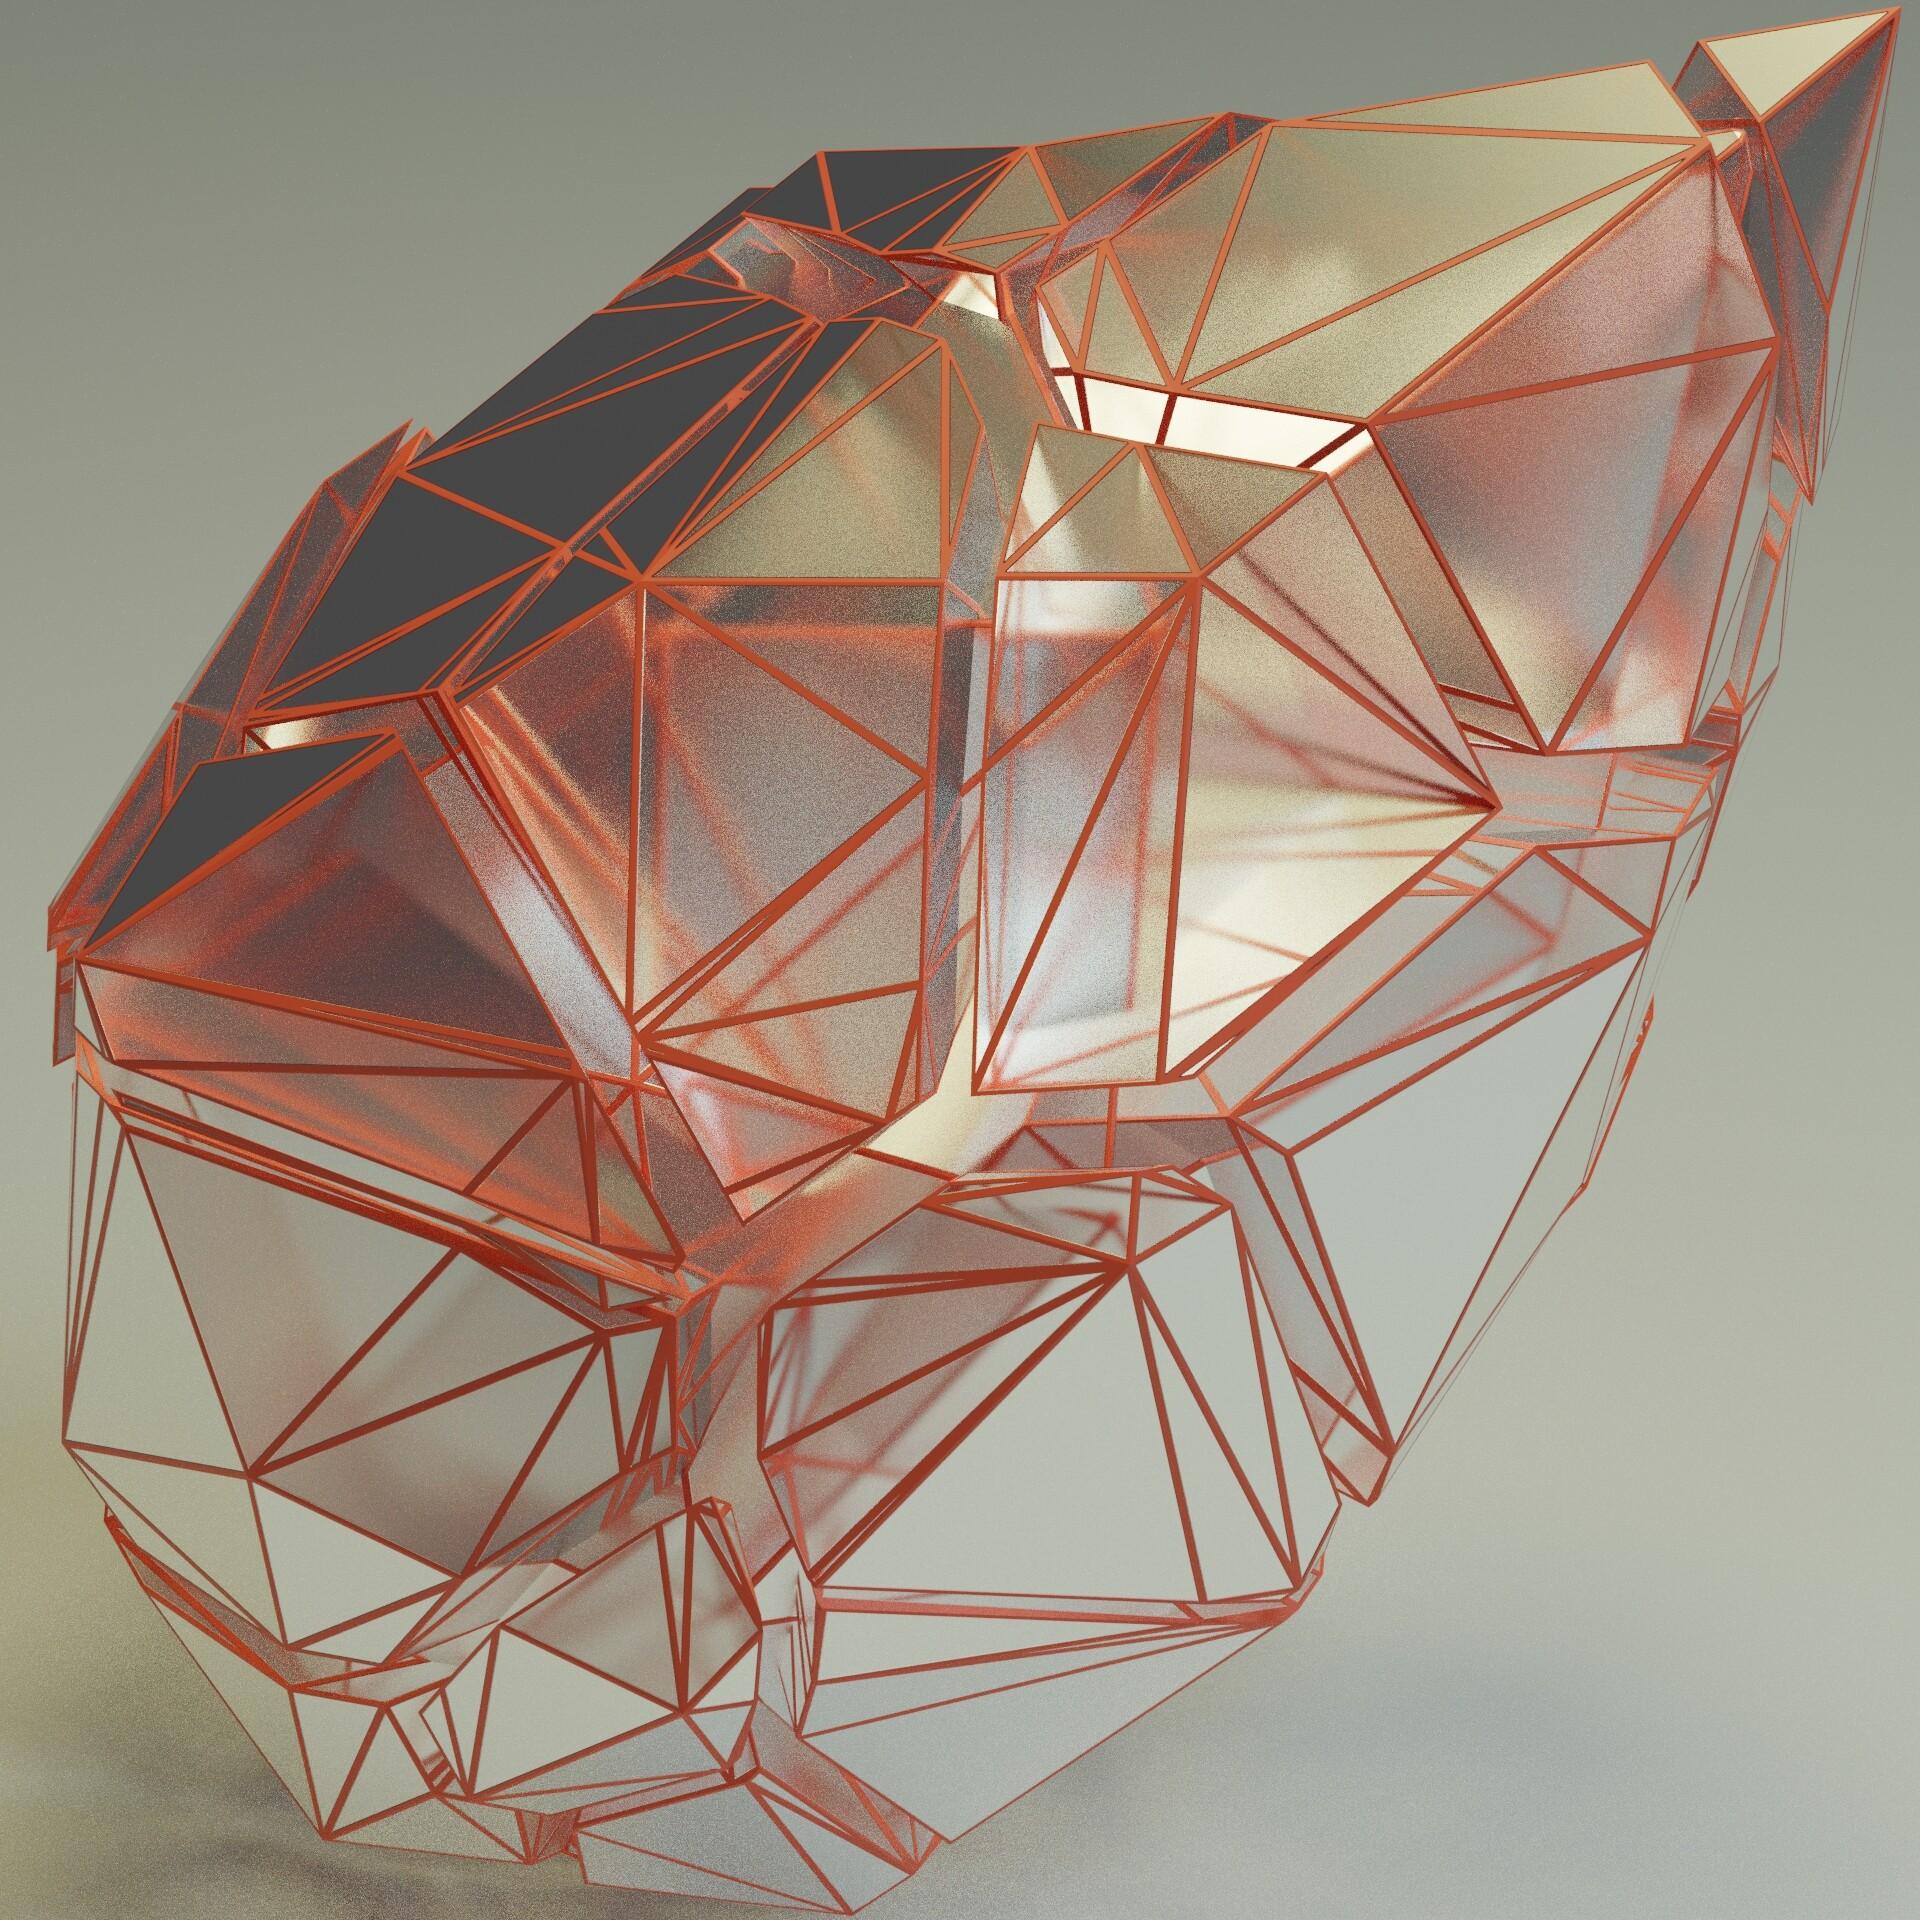 alexander-volkov-cube-fractured.jpg?1567